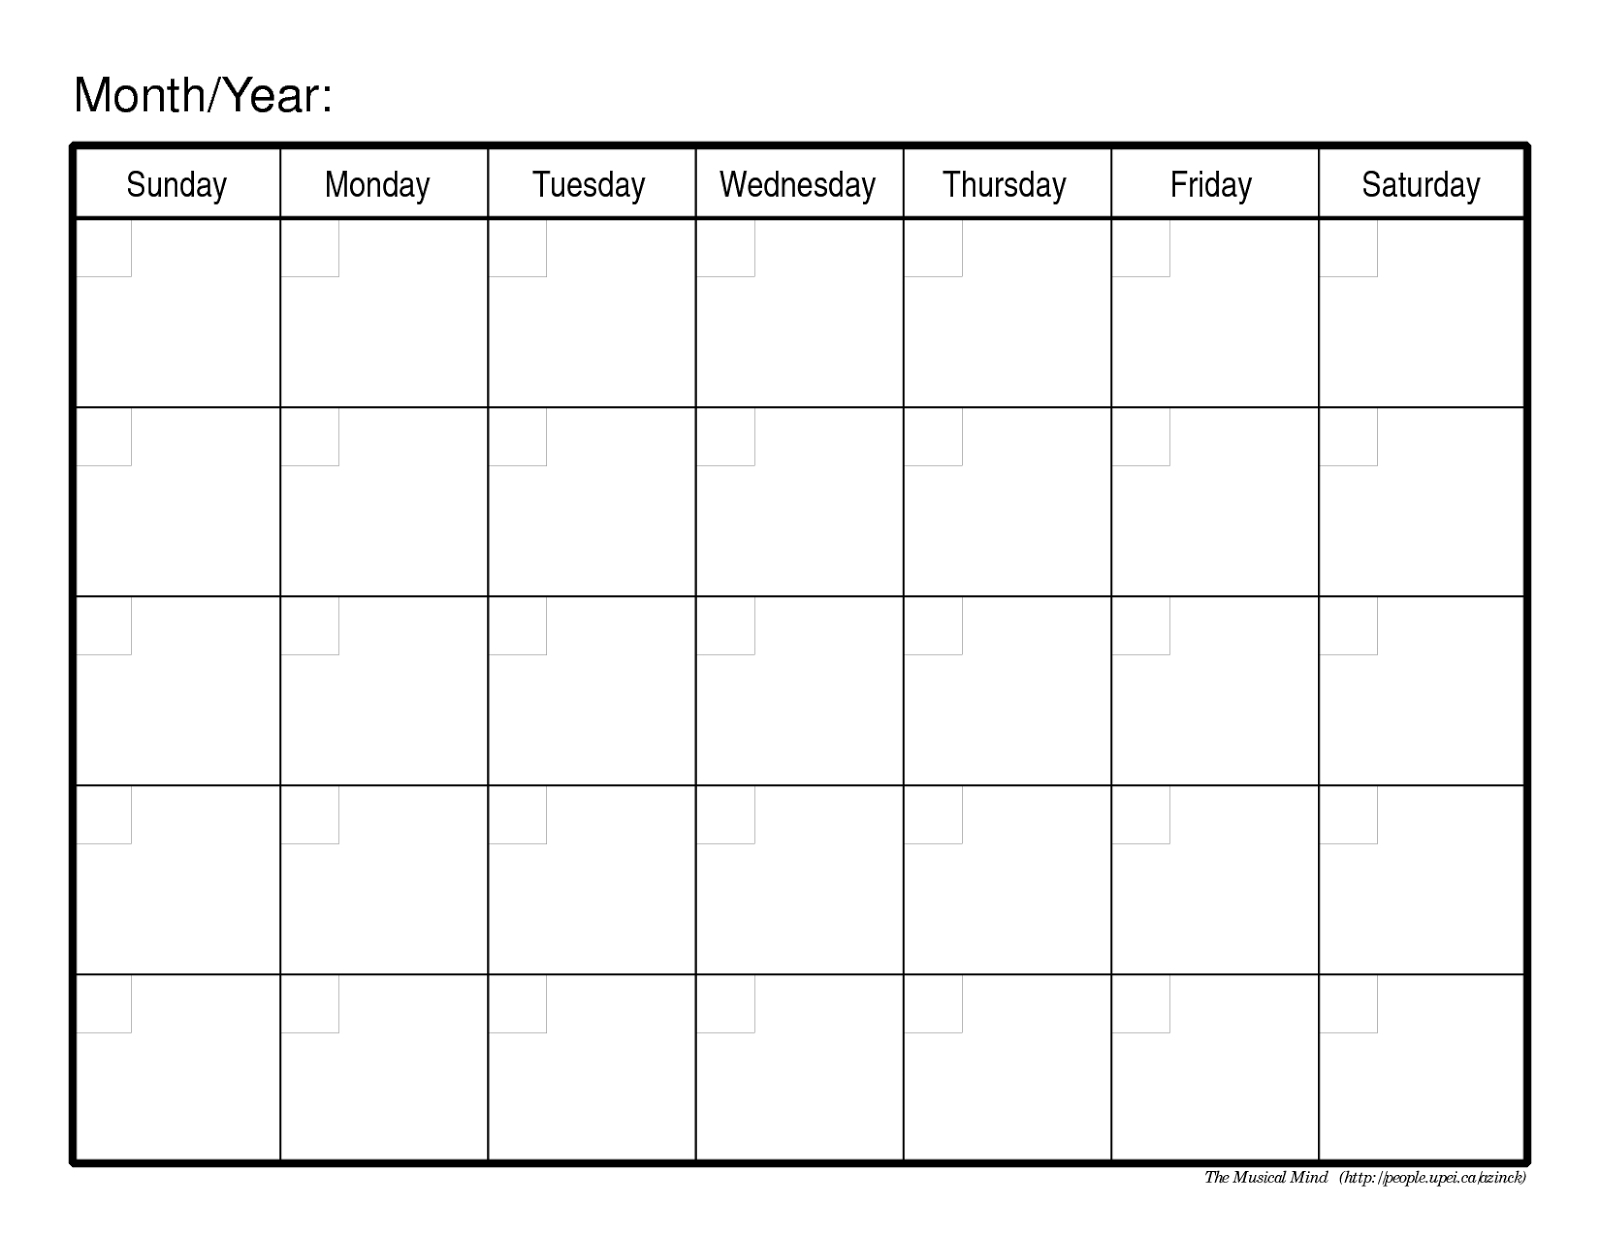 Calendar Template No Dates | Igotlockedout